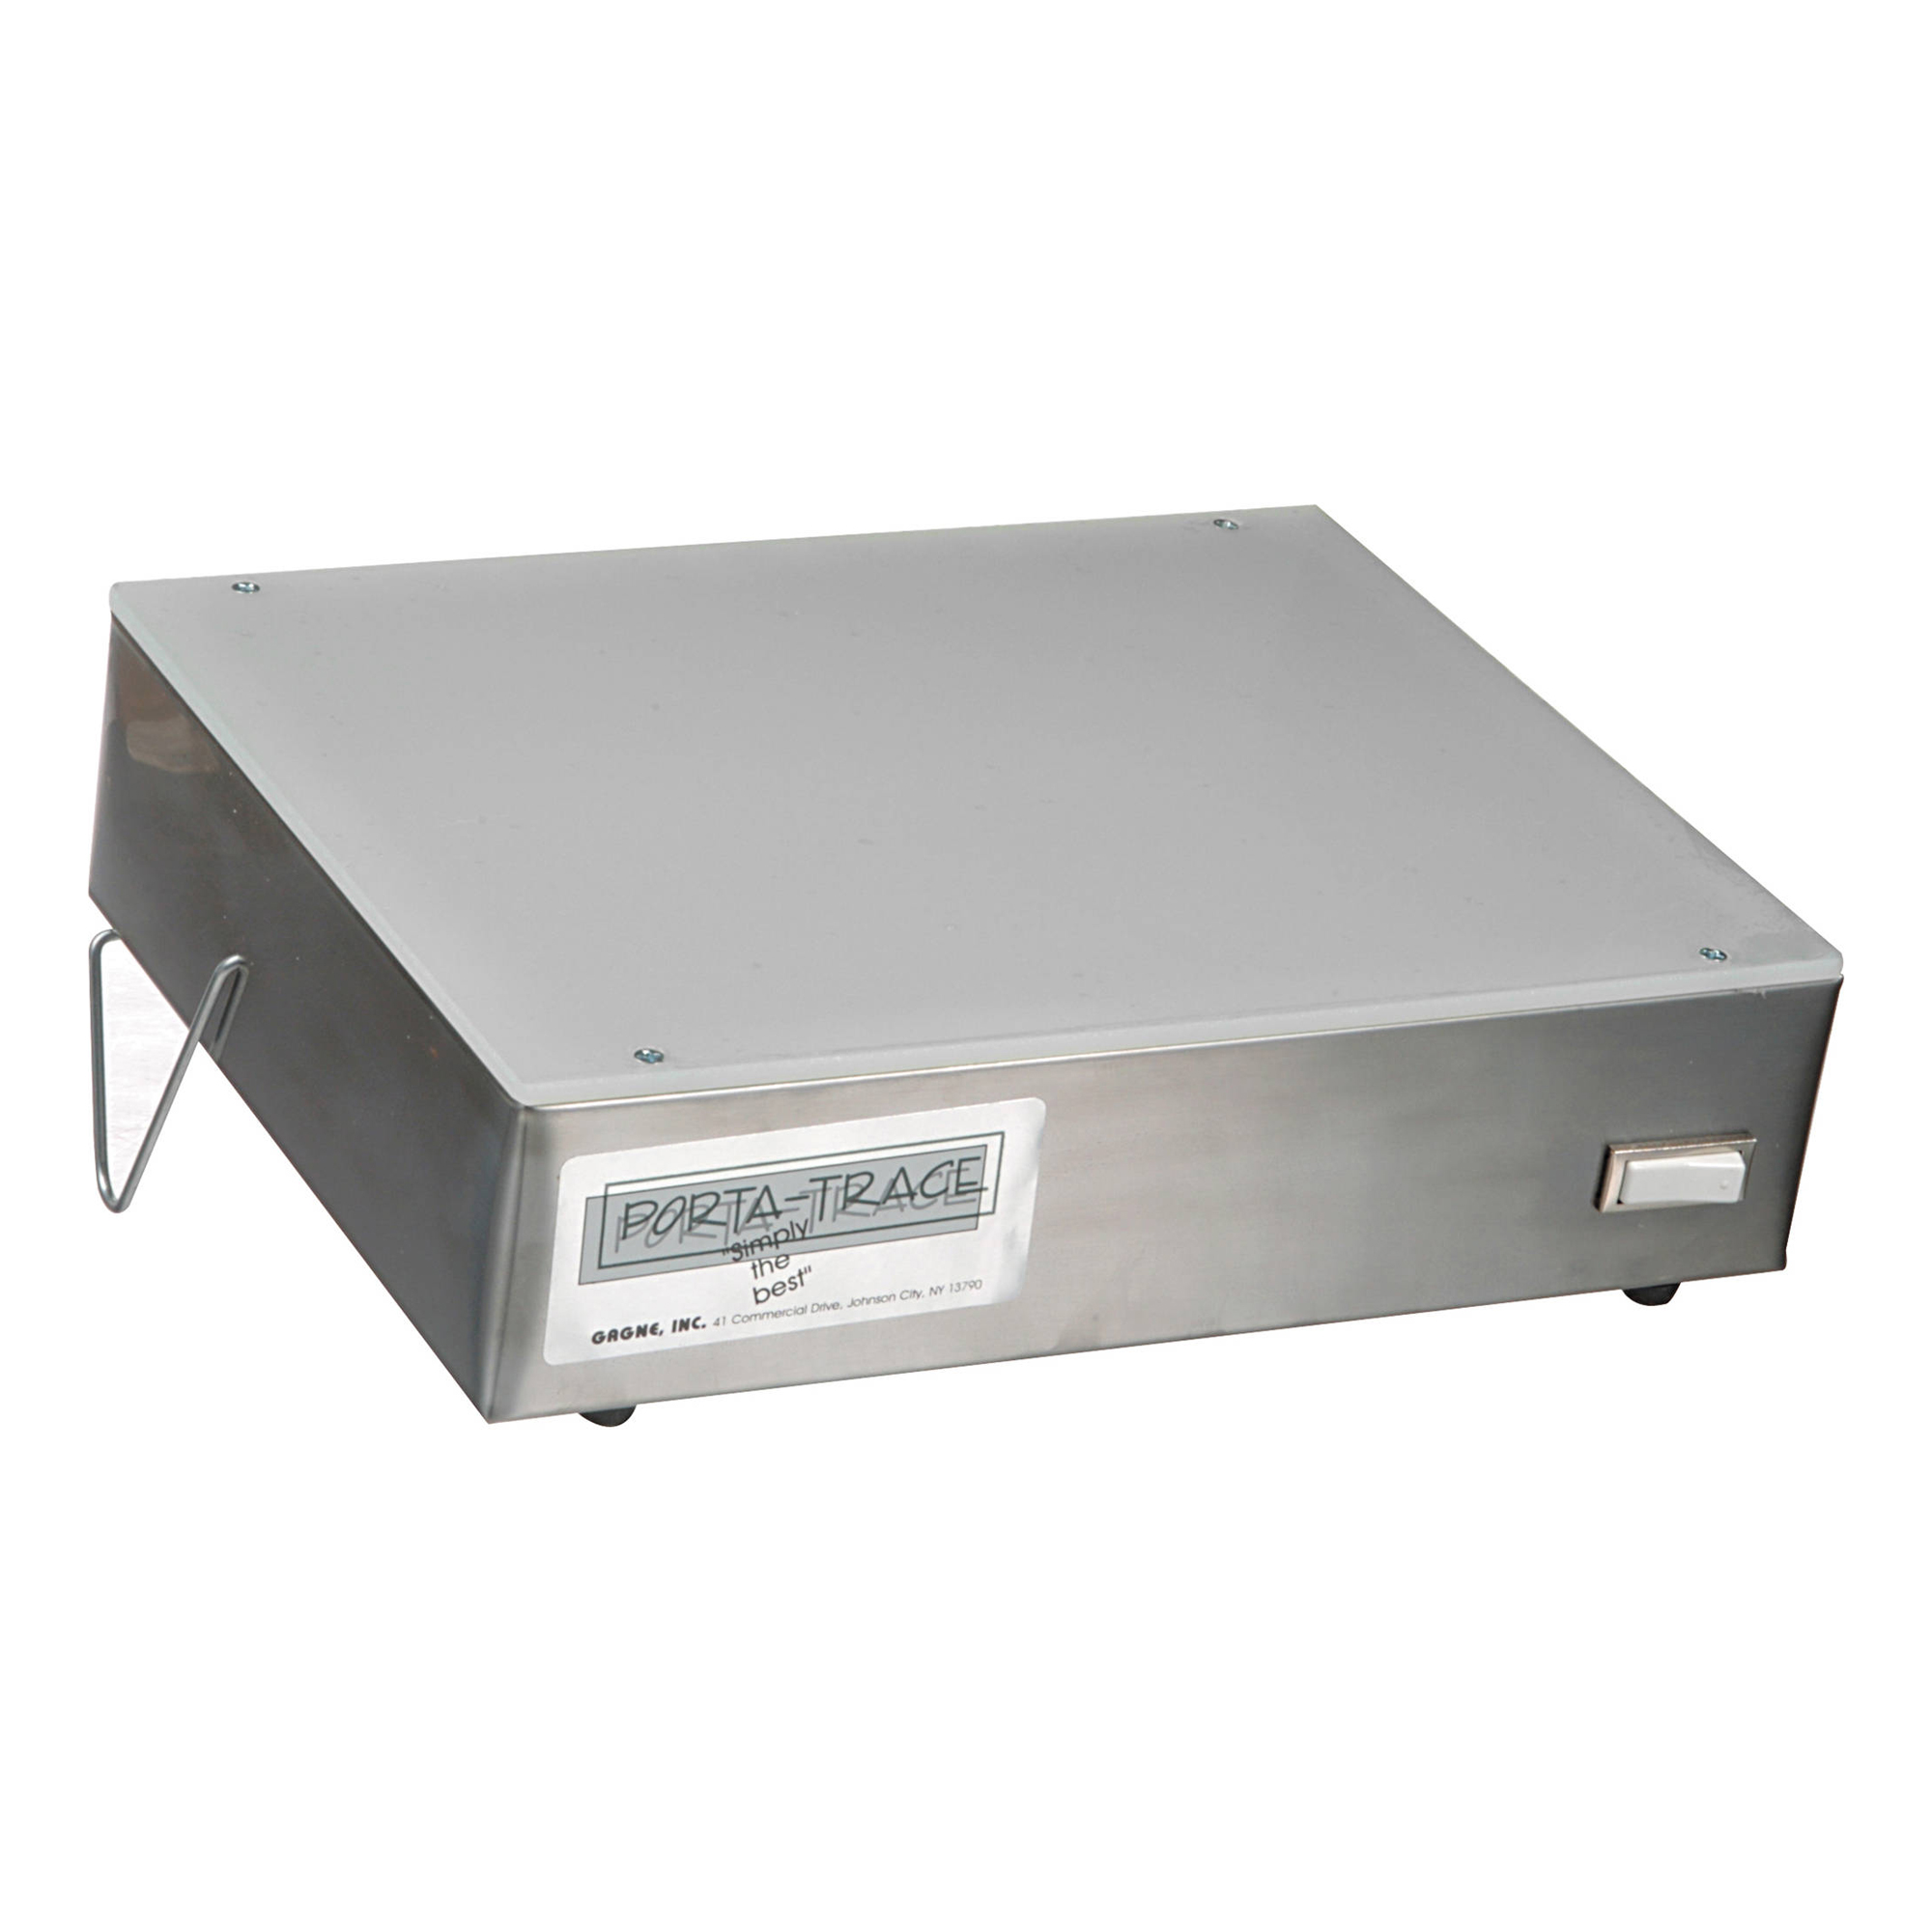 1012-2 Stainless Steel LED Light Box 10 x 12